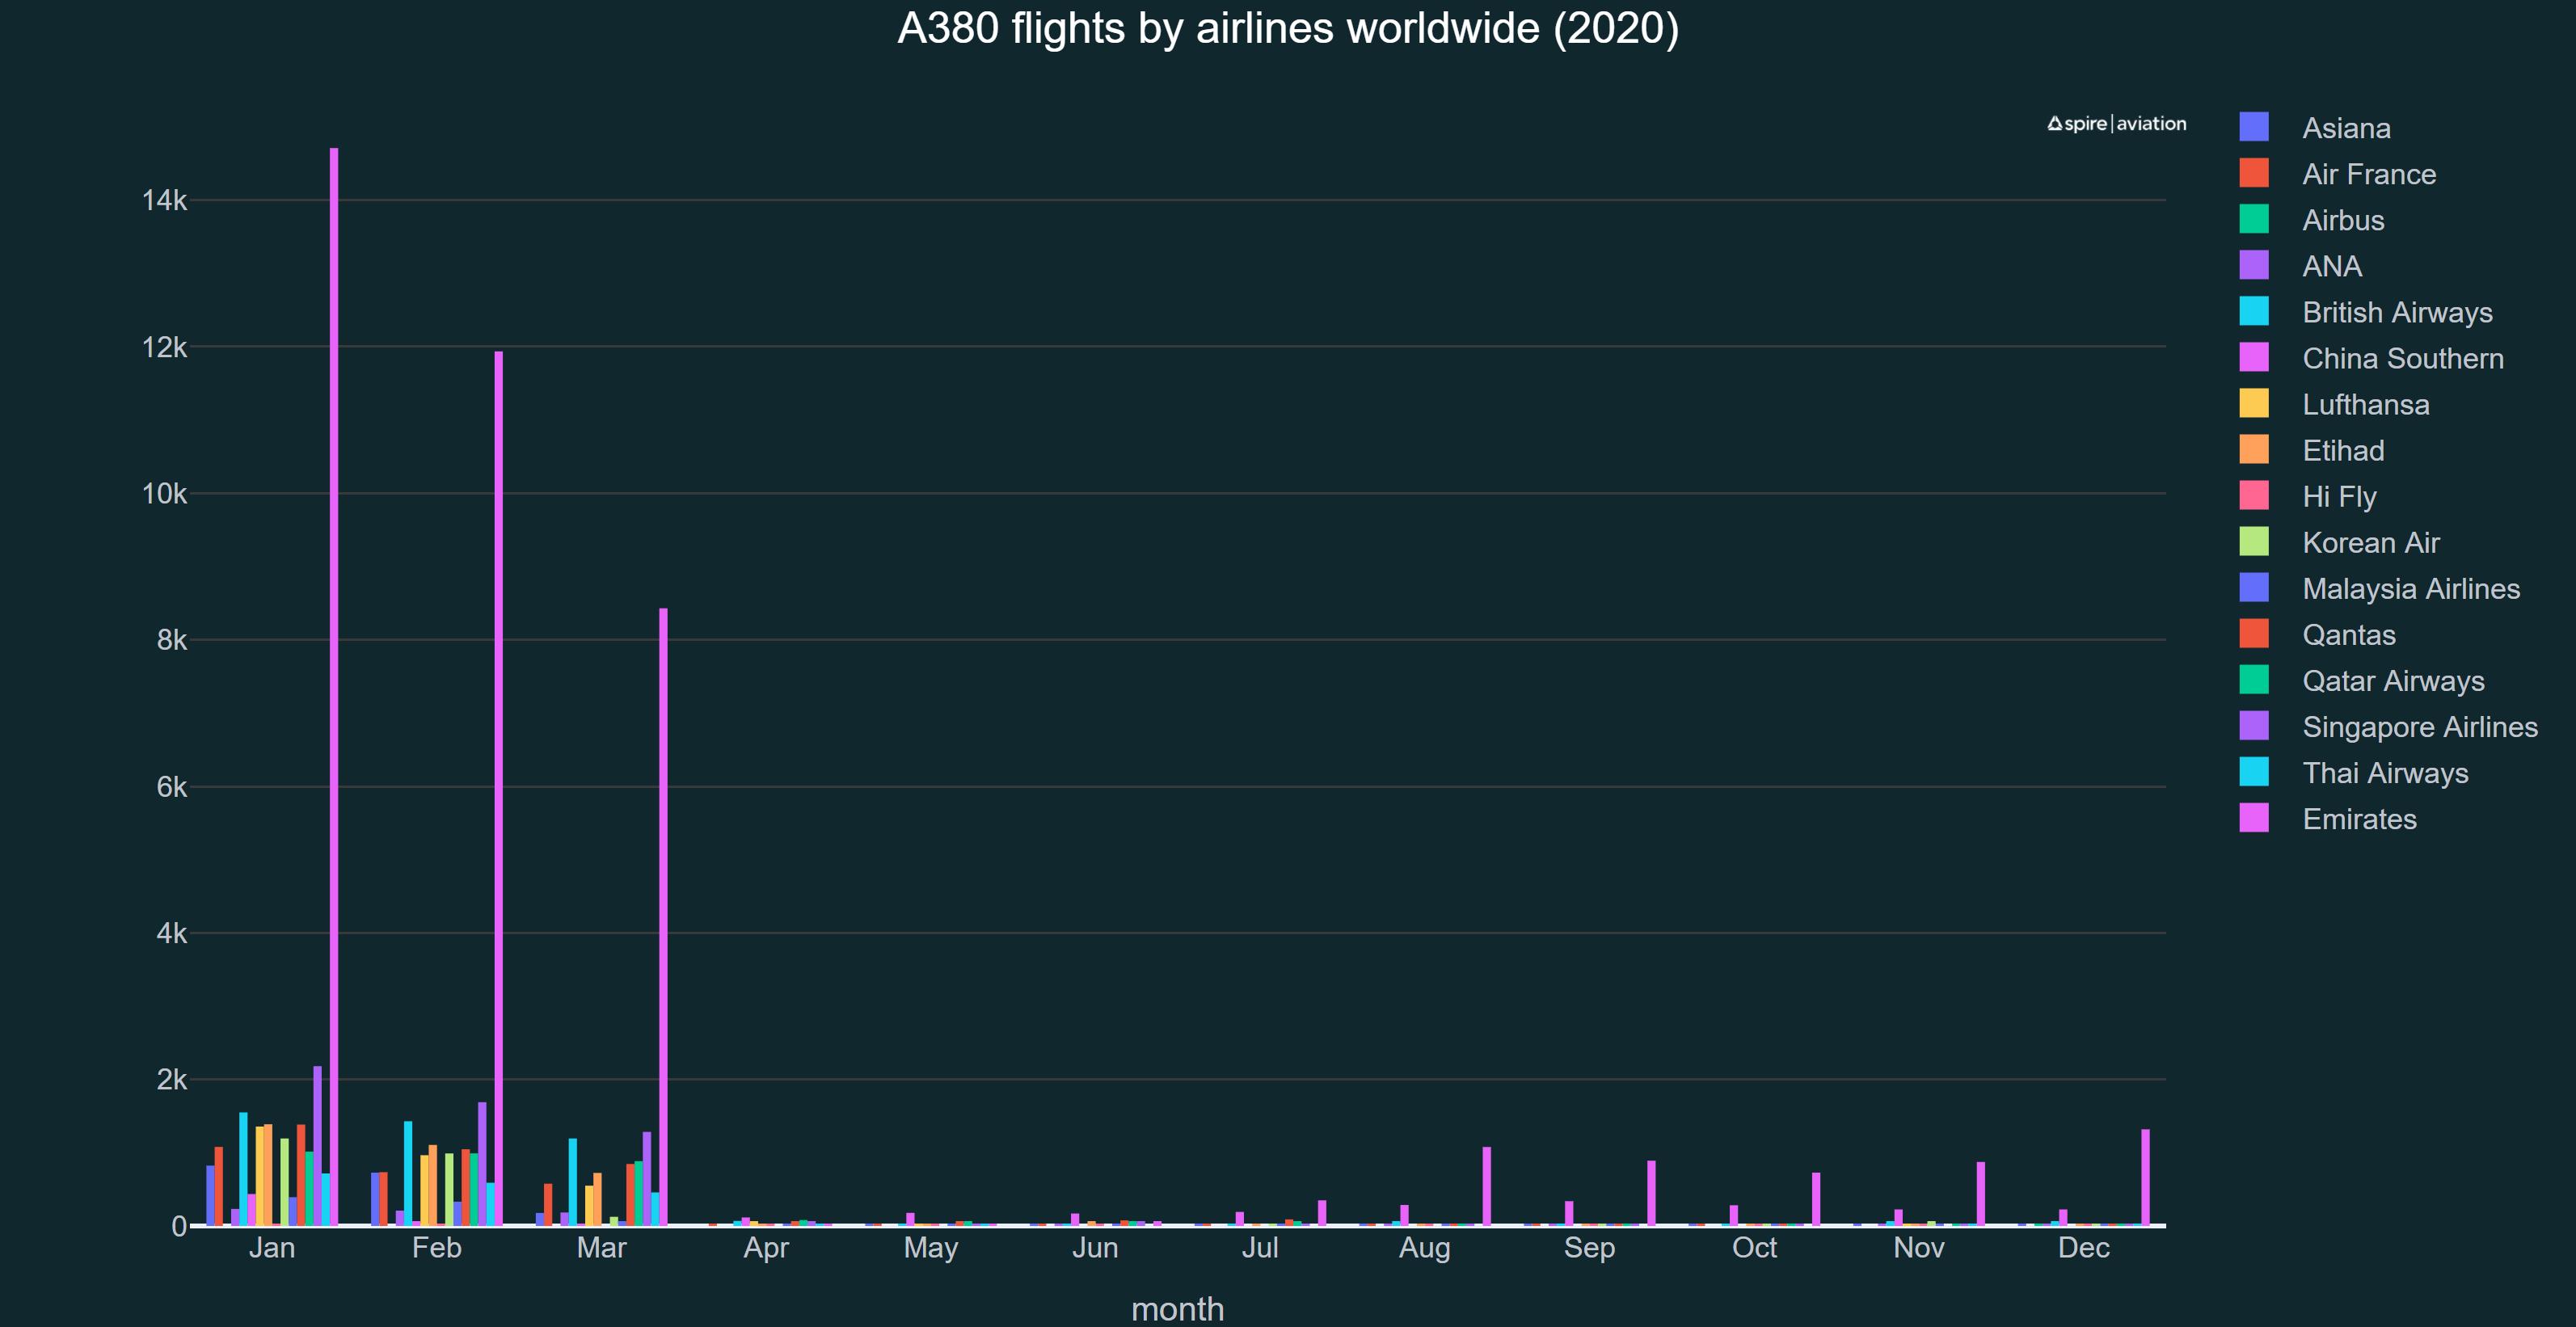 Graph showing A380 flights per operator through 2020